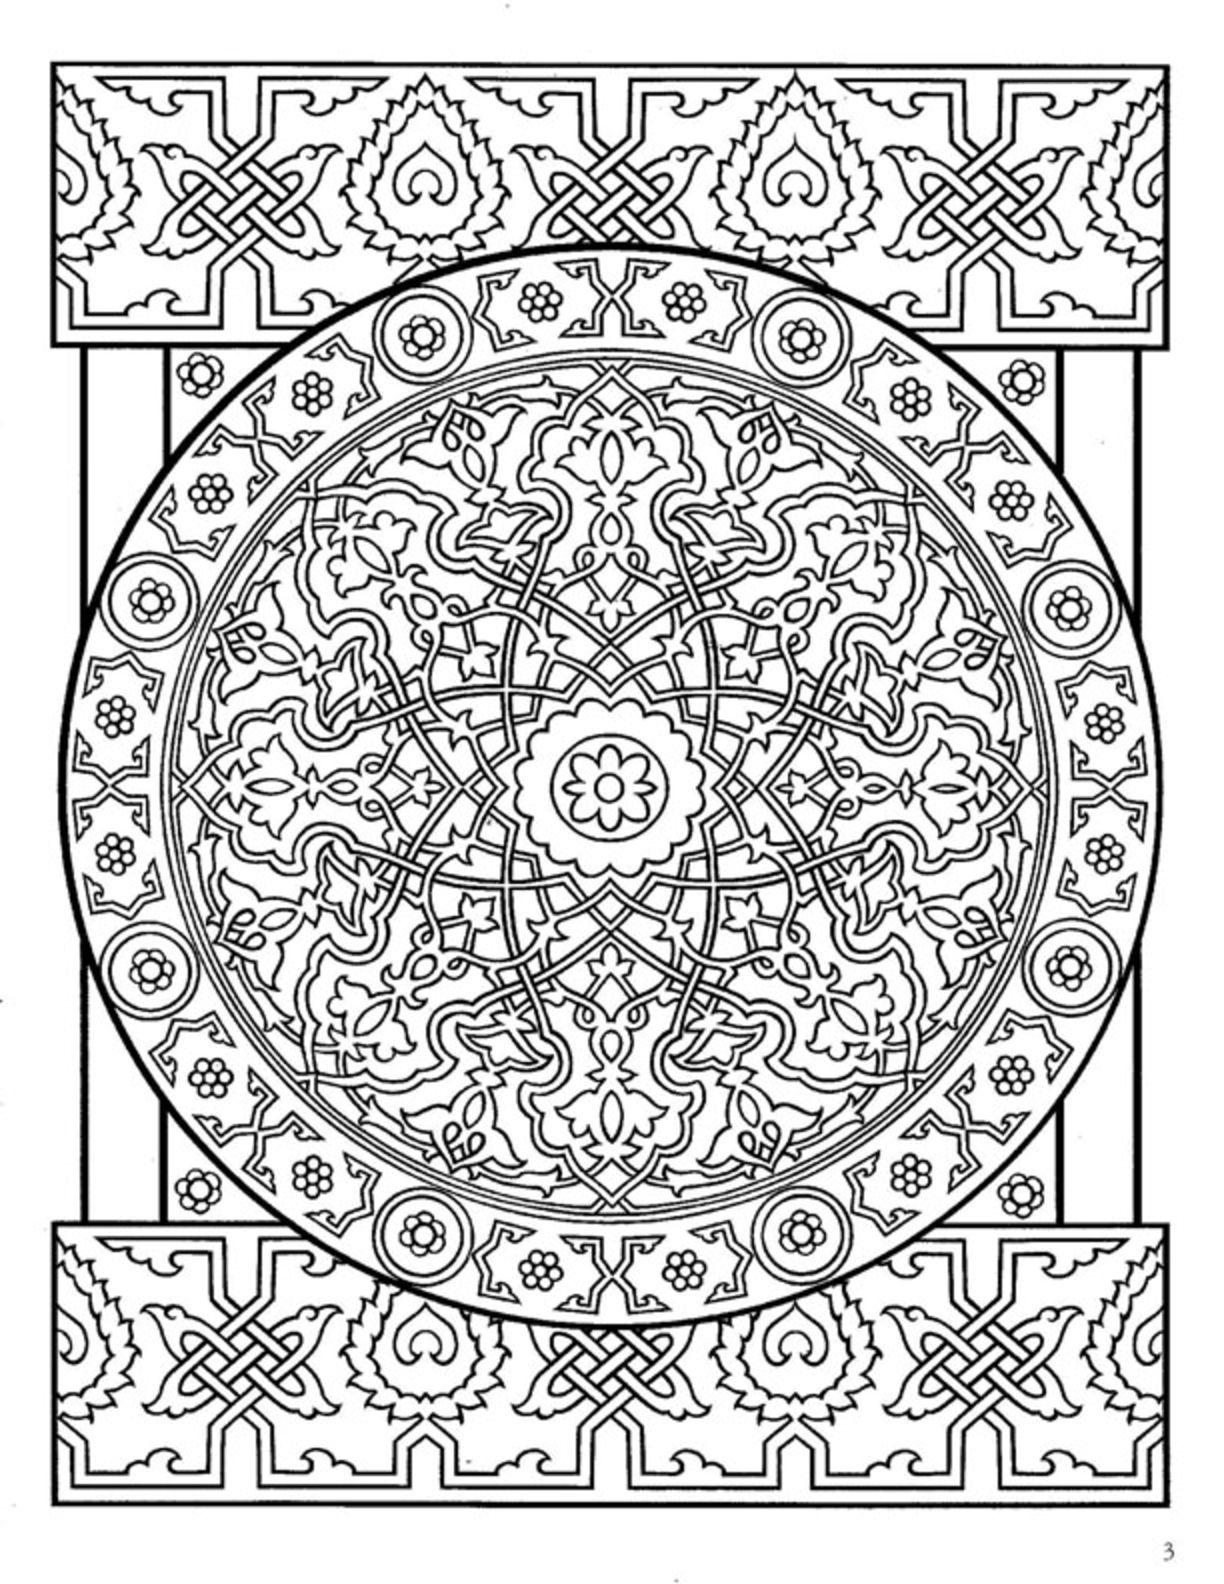 Dover Decorative Tile Coloring Book | Mandalas | Pinterest ...